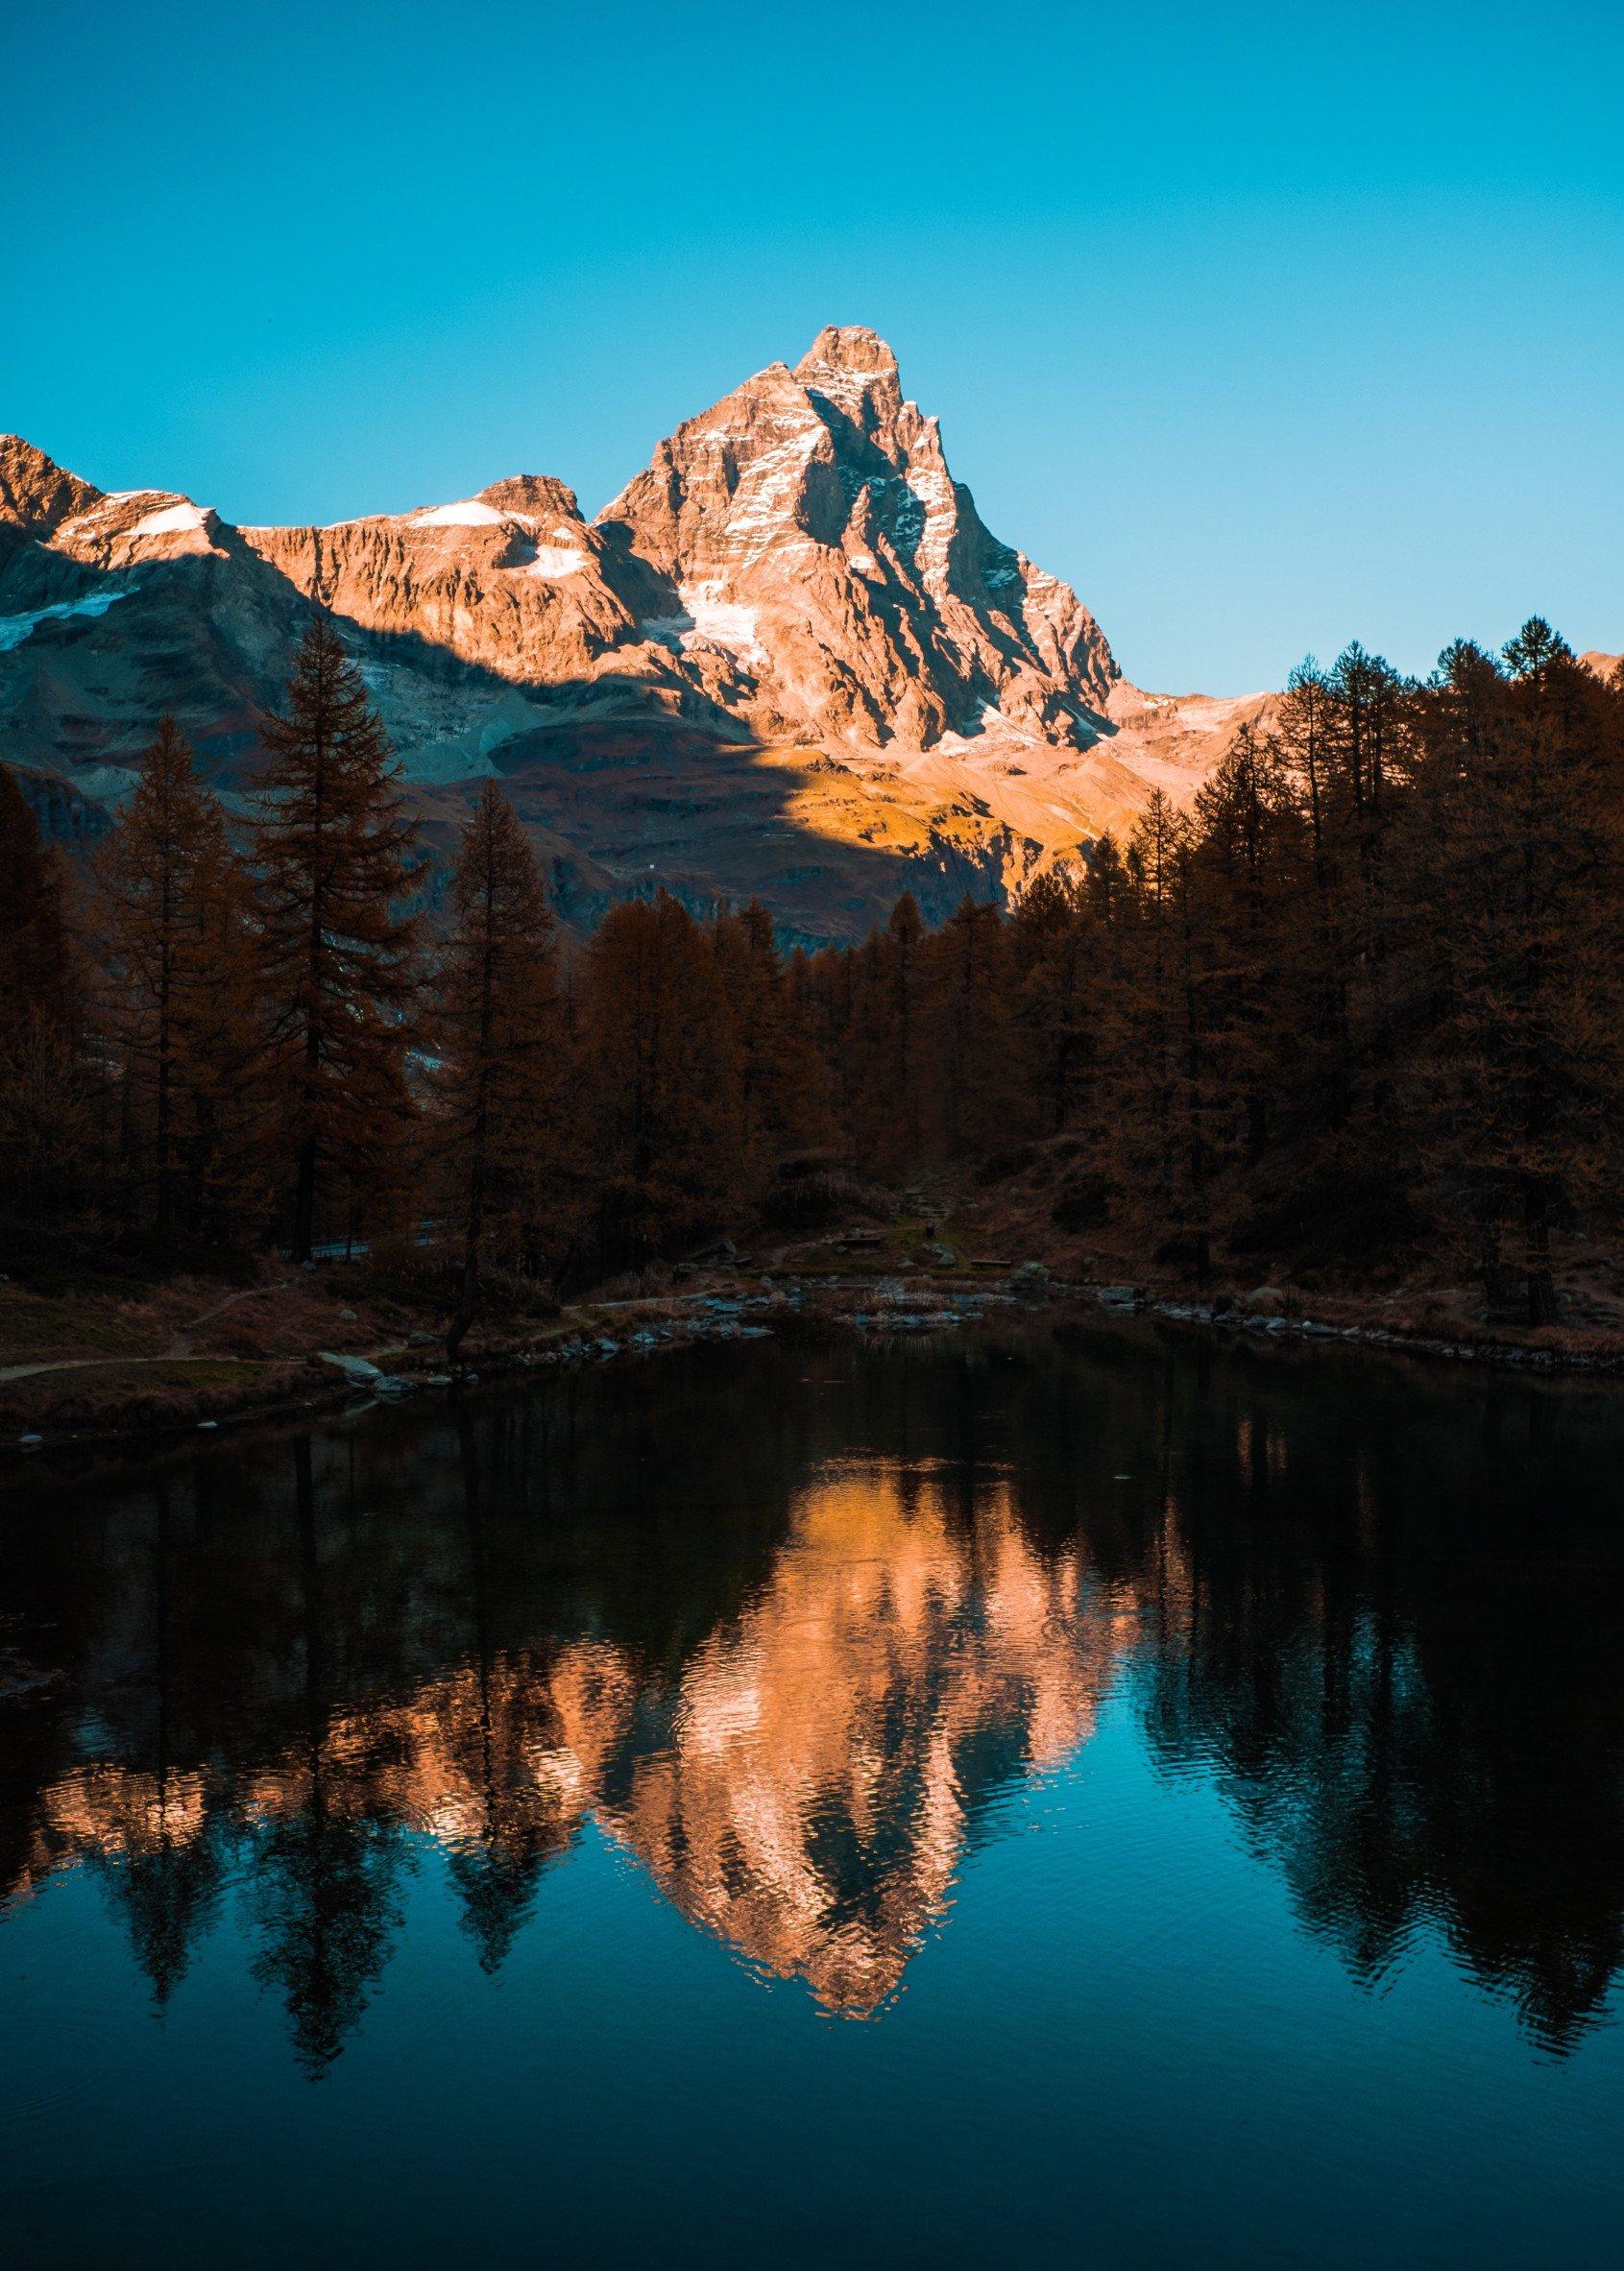 lake midday mountain